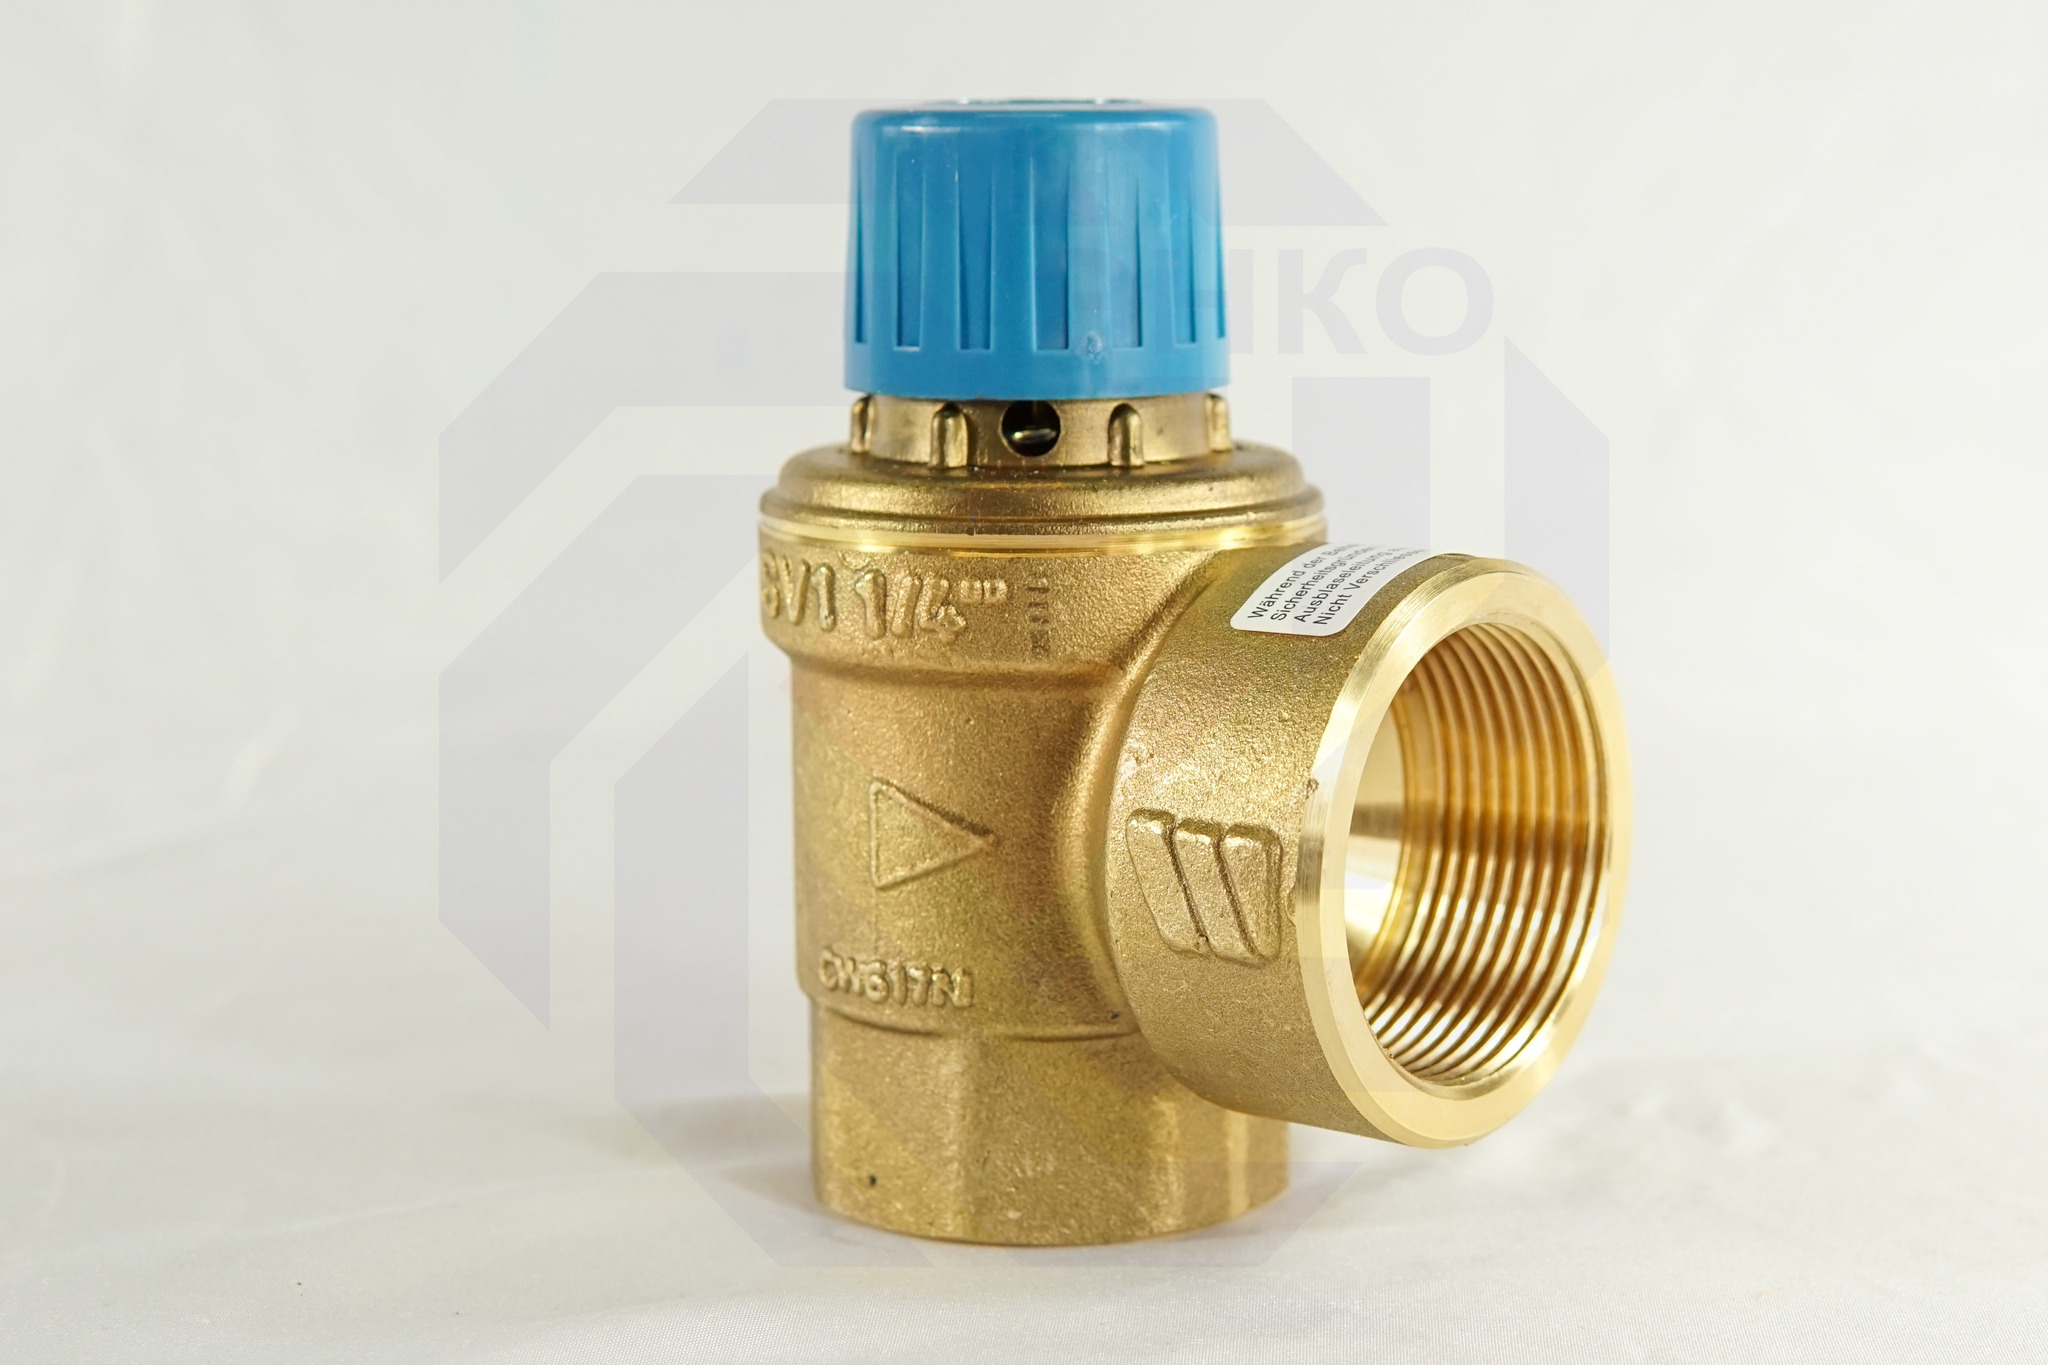 Клапан предохранительный WATTS SVW 4 бар 1¼